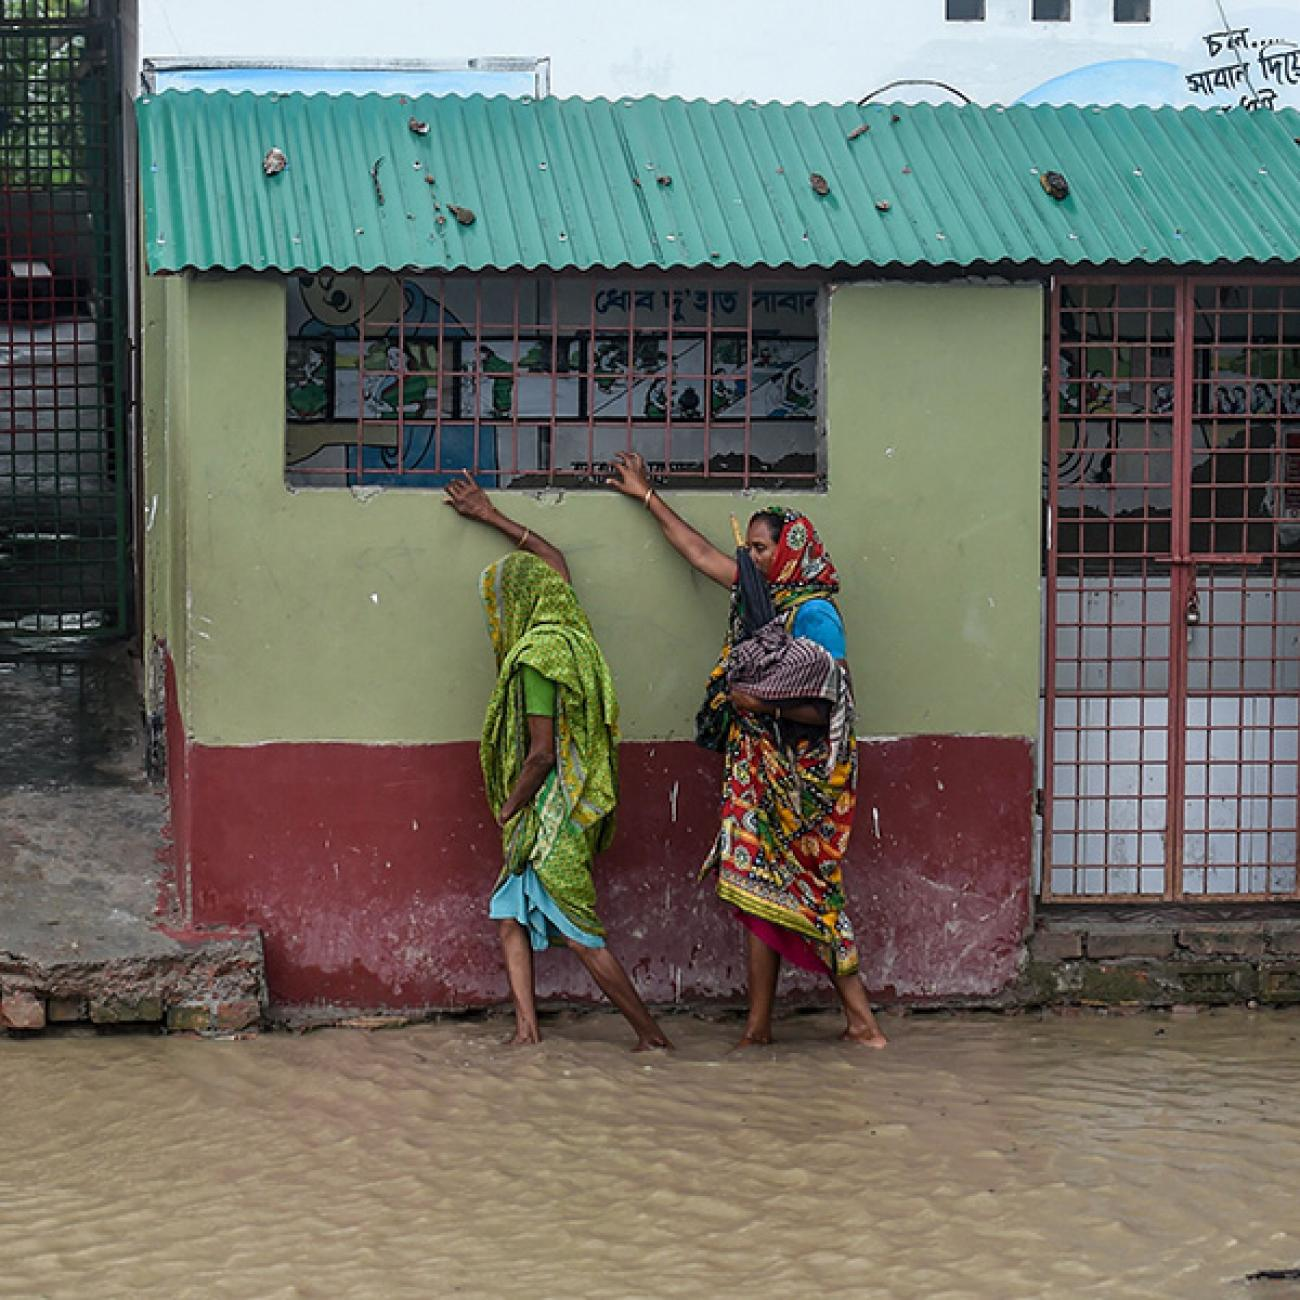 https://www.thinkglobalhealth.org/sites/default/files/styles/max_1300x1300_1_1/public/2020-06/Basu.Chaudhuri-CoV-Climate-6.8.20-GettyImages-1214181303-SQUARE.jpg?itok=siQTp-A_